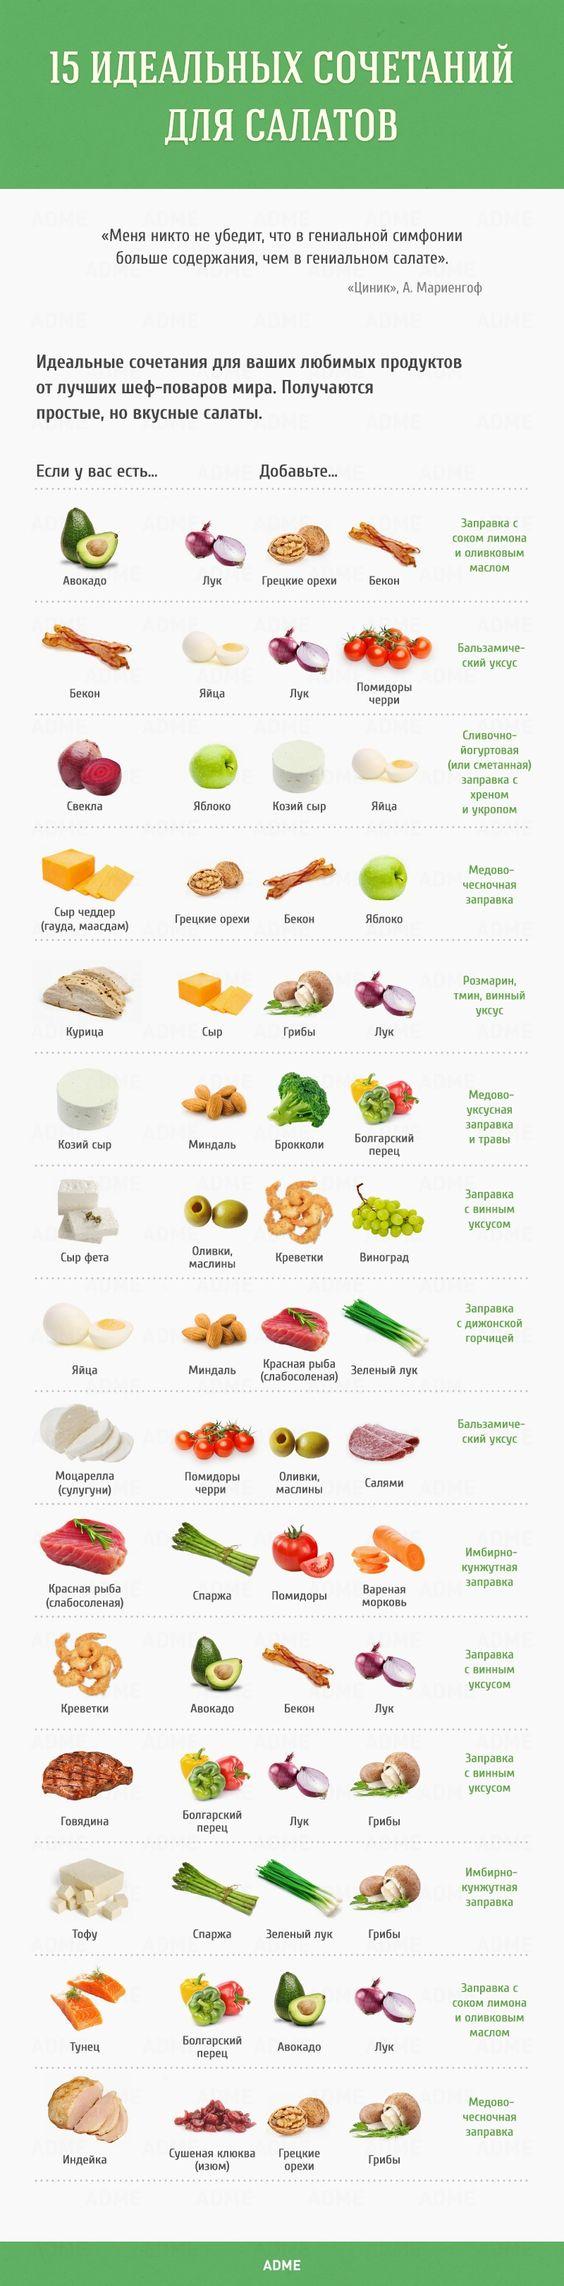 Гид по кухне и готовке: